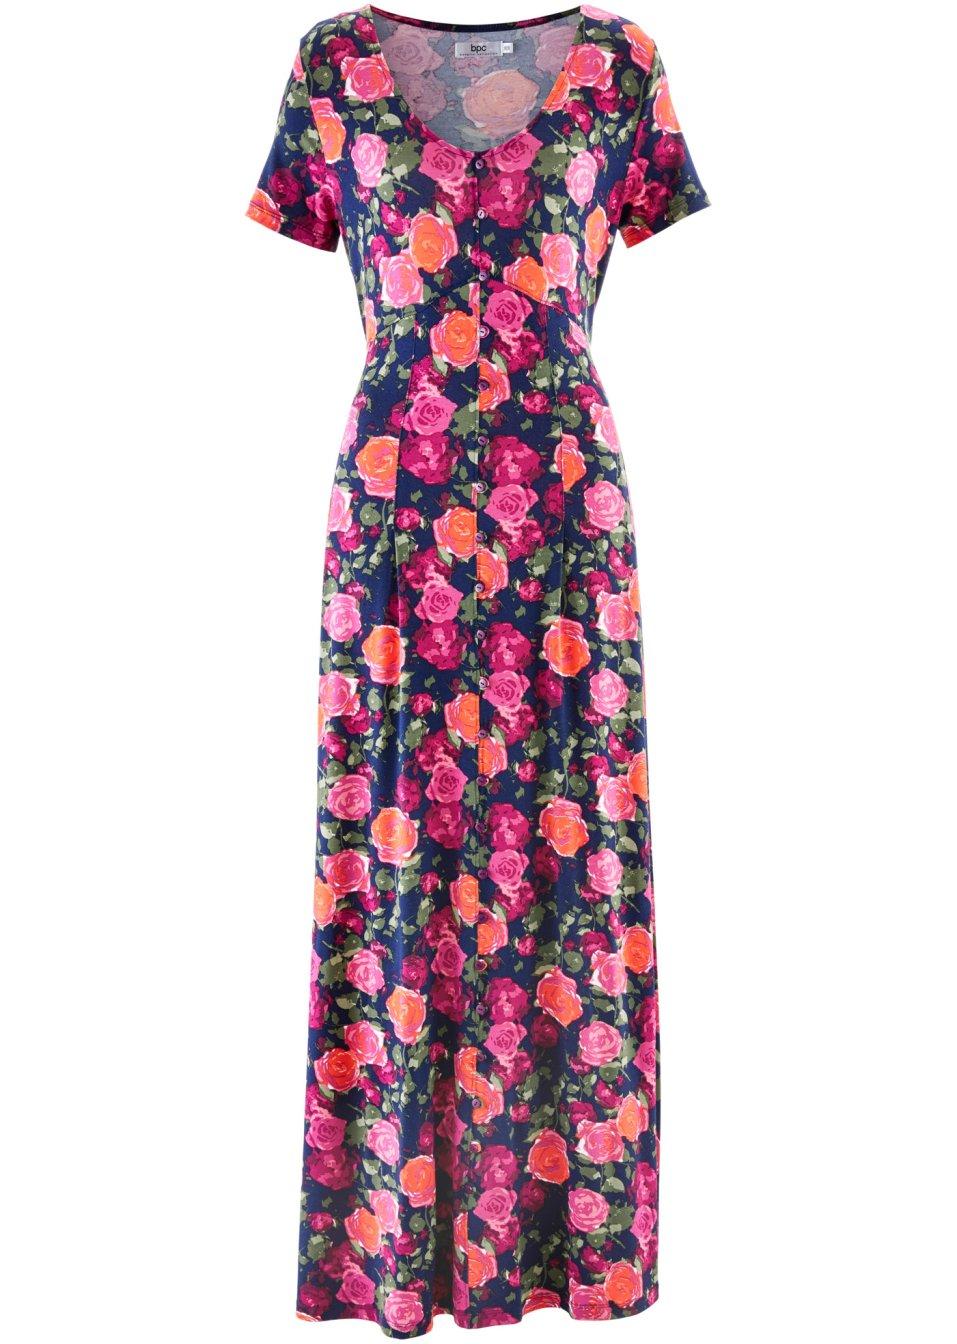 robe longue manches courtes bleu fleurs femme. Black Bedroom Furniture Sets. Home Design Ideas